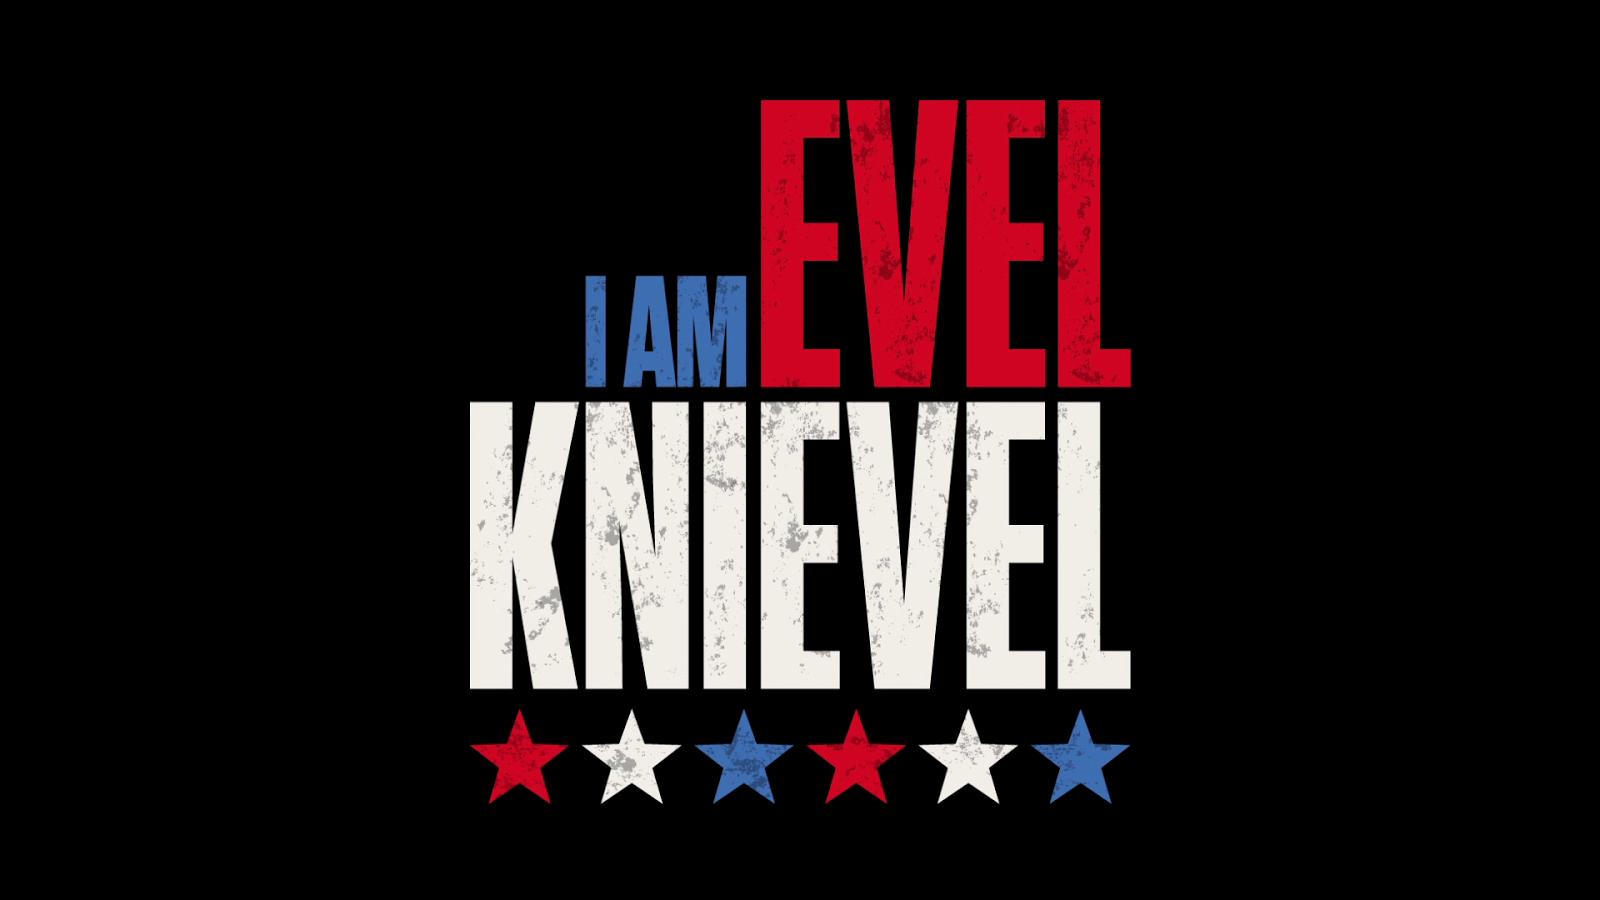 USA EVIL KNIEVEL CABIN//SCHOOL//COLLEGE//SPORTS SHOULDER BAG PAUL FRANK RED